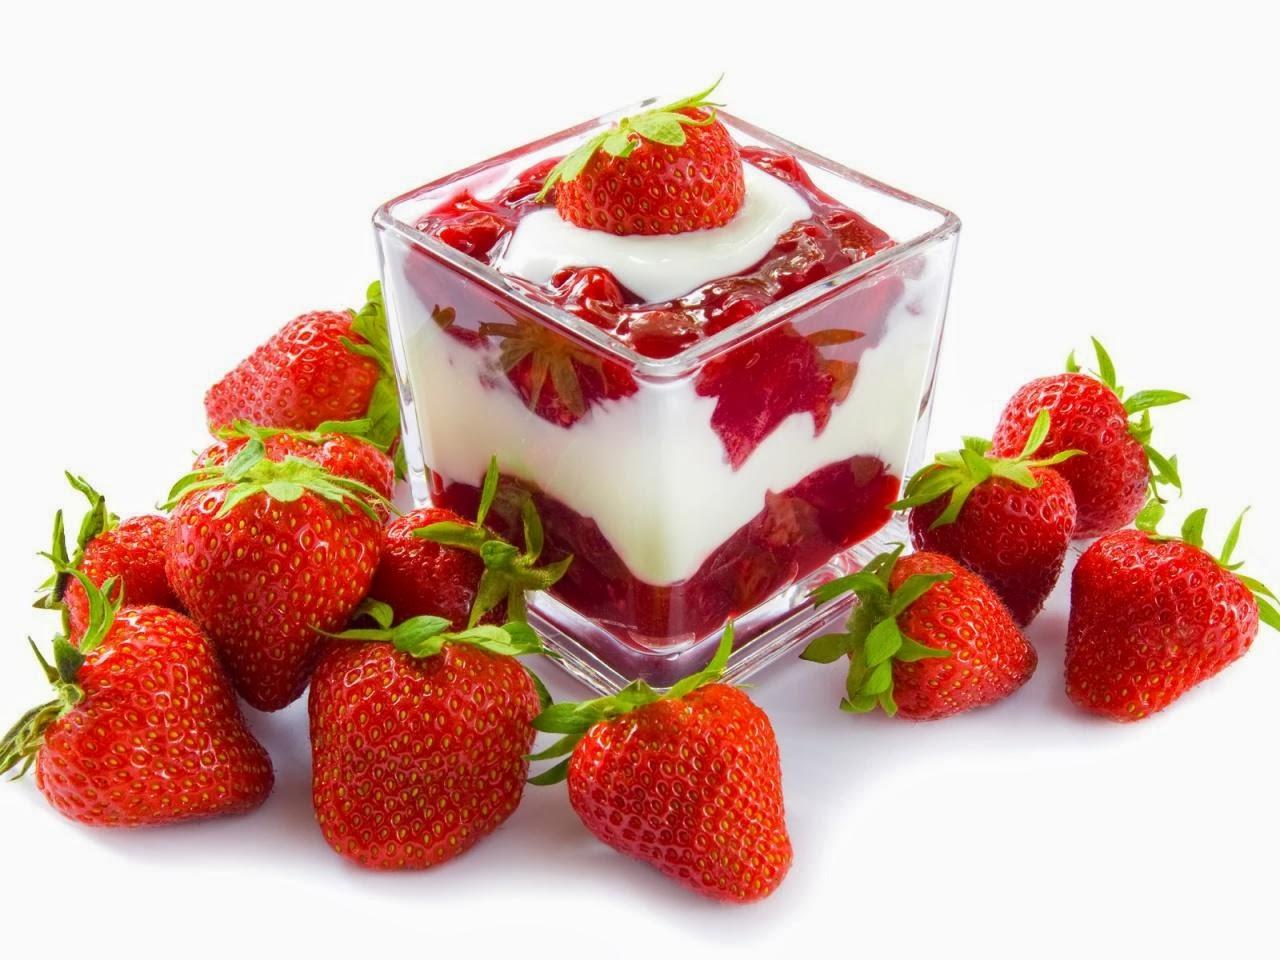 http://www.funmag.org/pictures-mag/food-images/free-desktop-wallpapres-of-food/